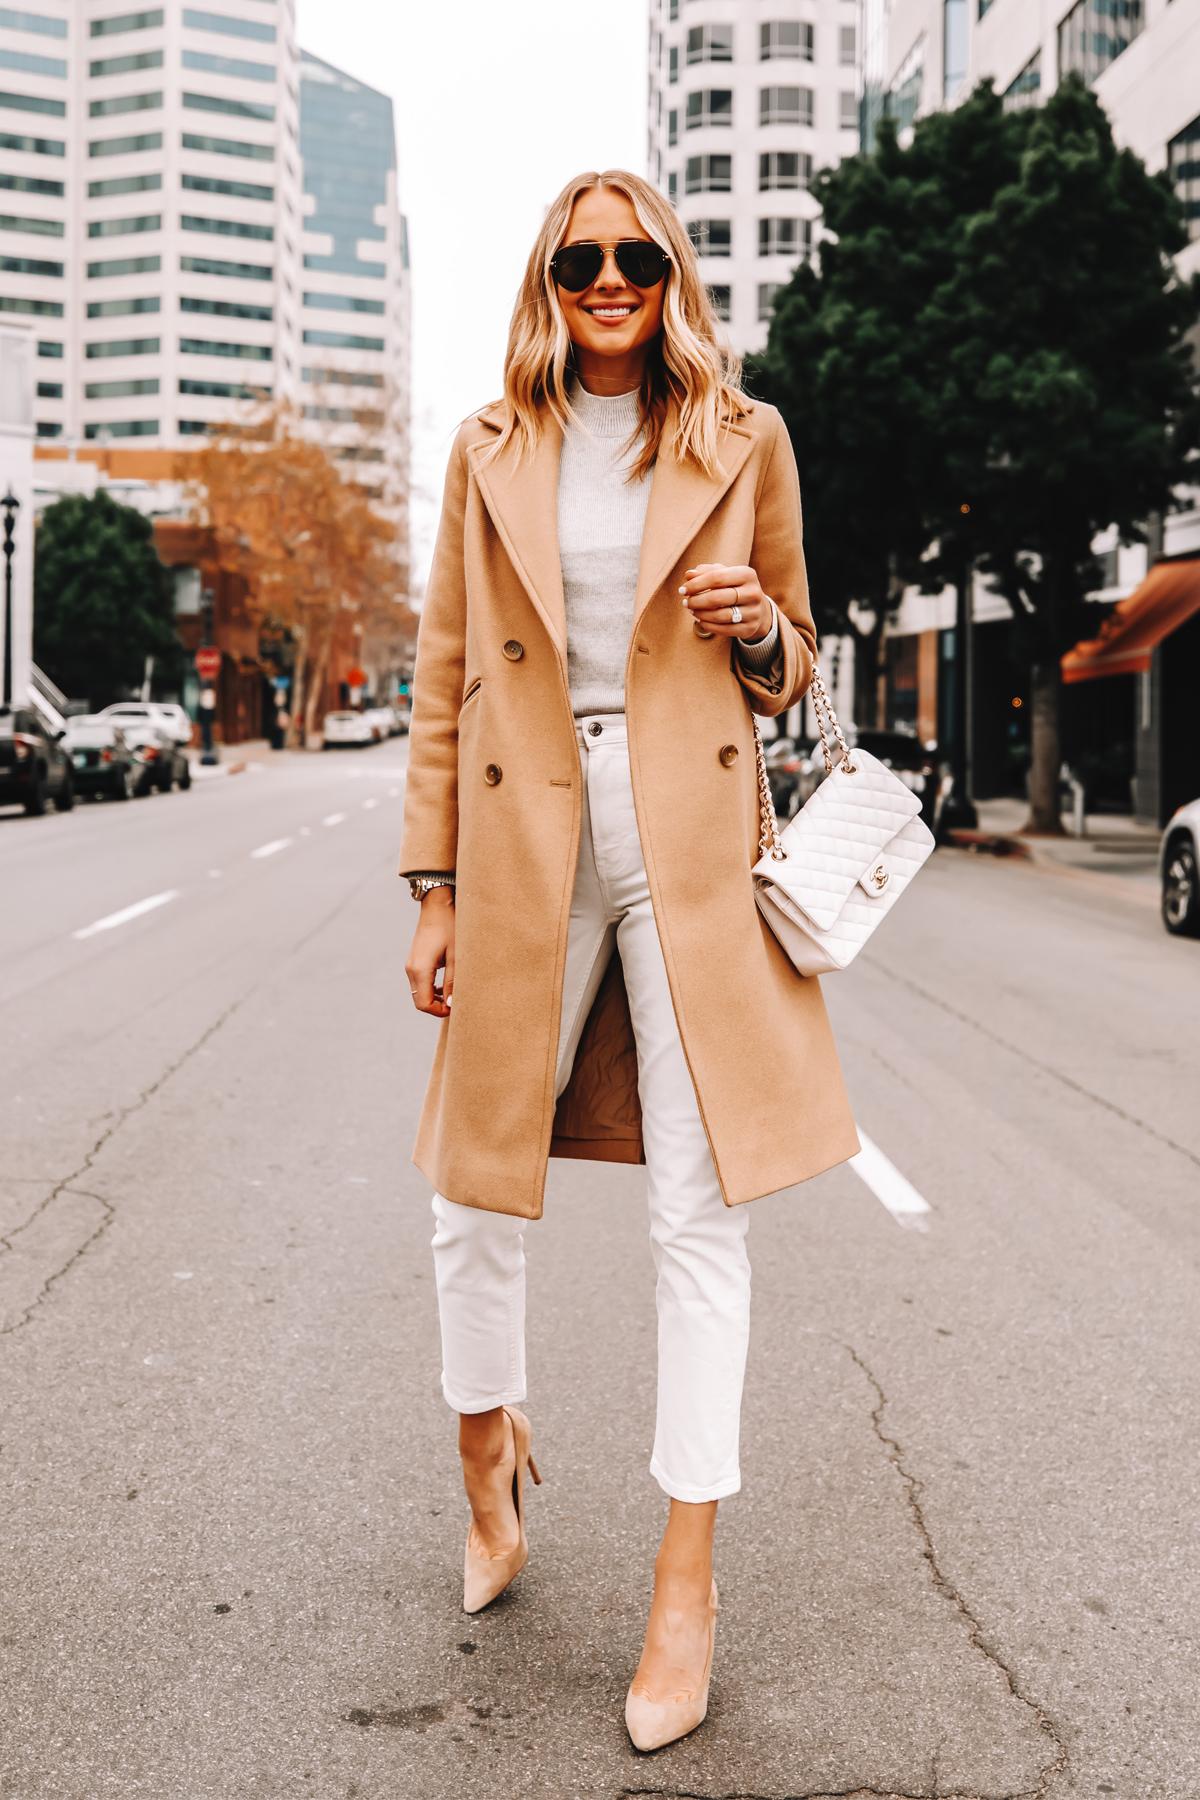 Fashion Jackson Wearing Everlane Camel Coat Grey Sweater White Jeans Nude Pumps 1